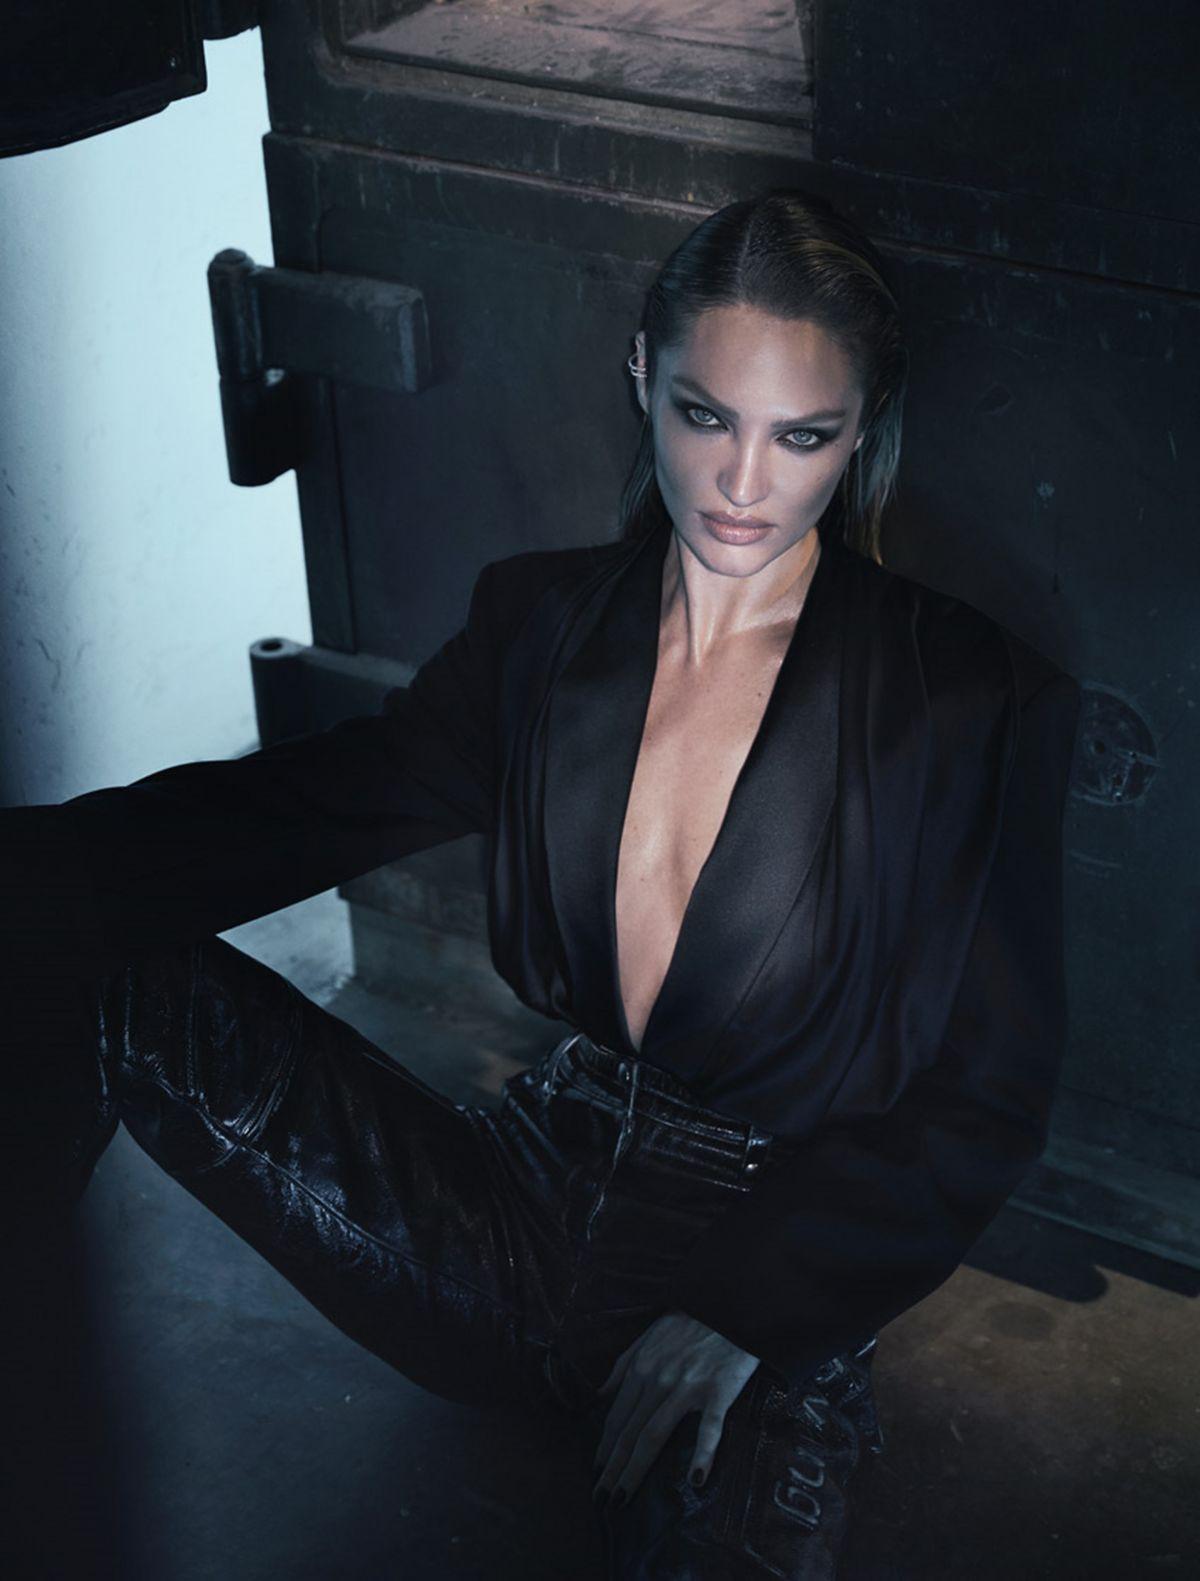 Candice Swanepoel Sexy Photoshoot | Hot Celebs Home